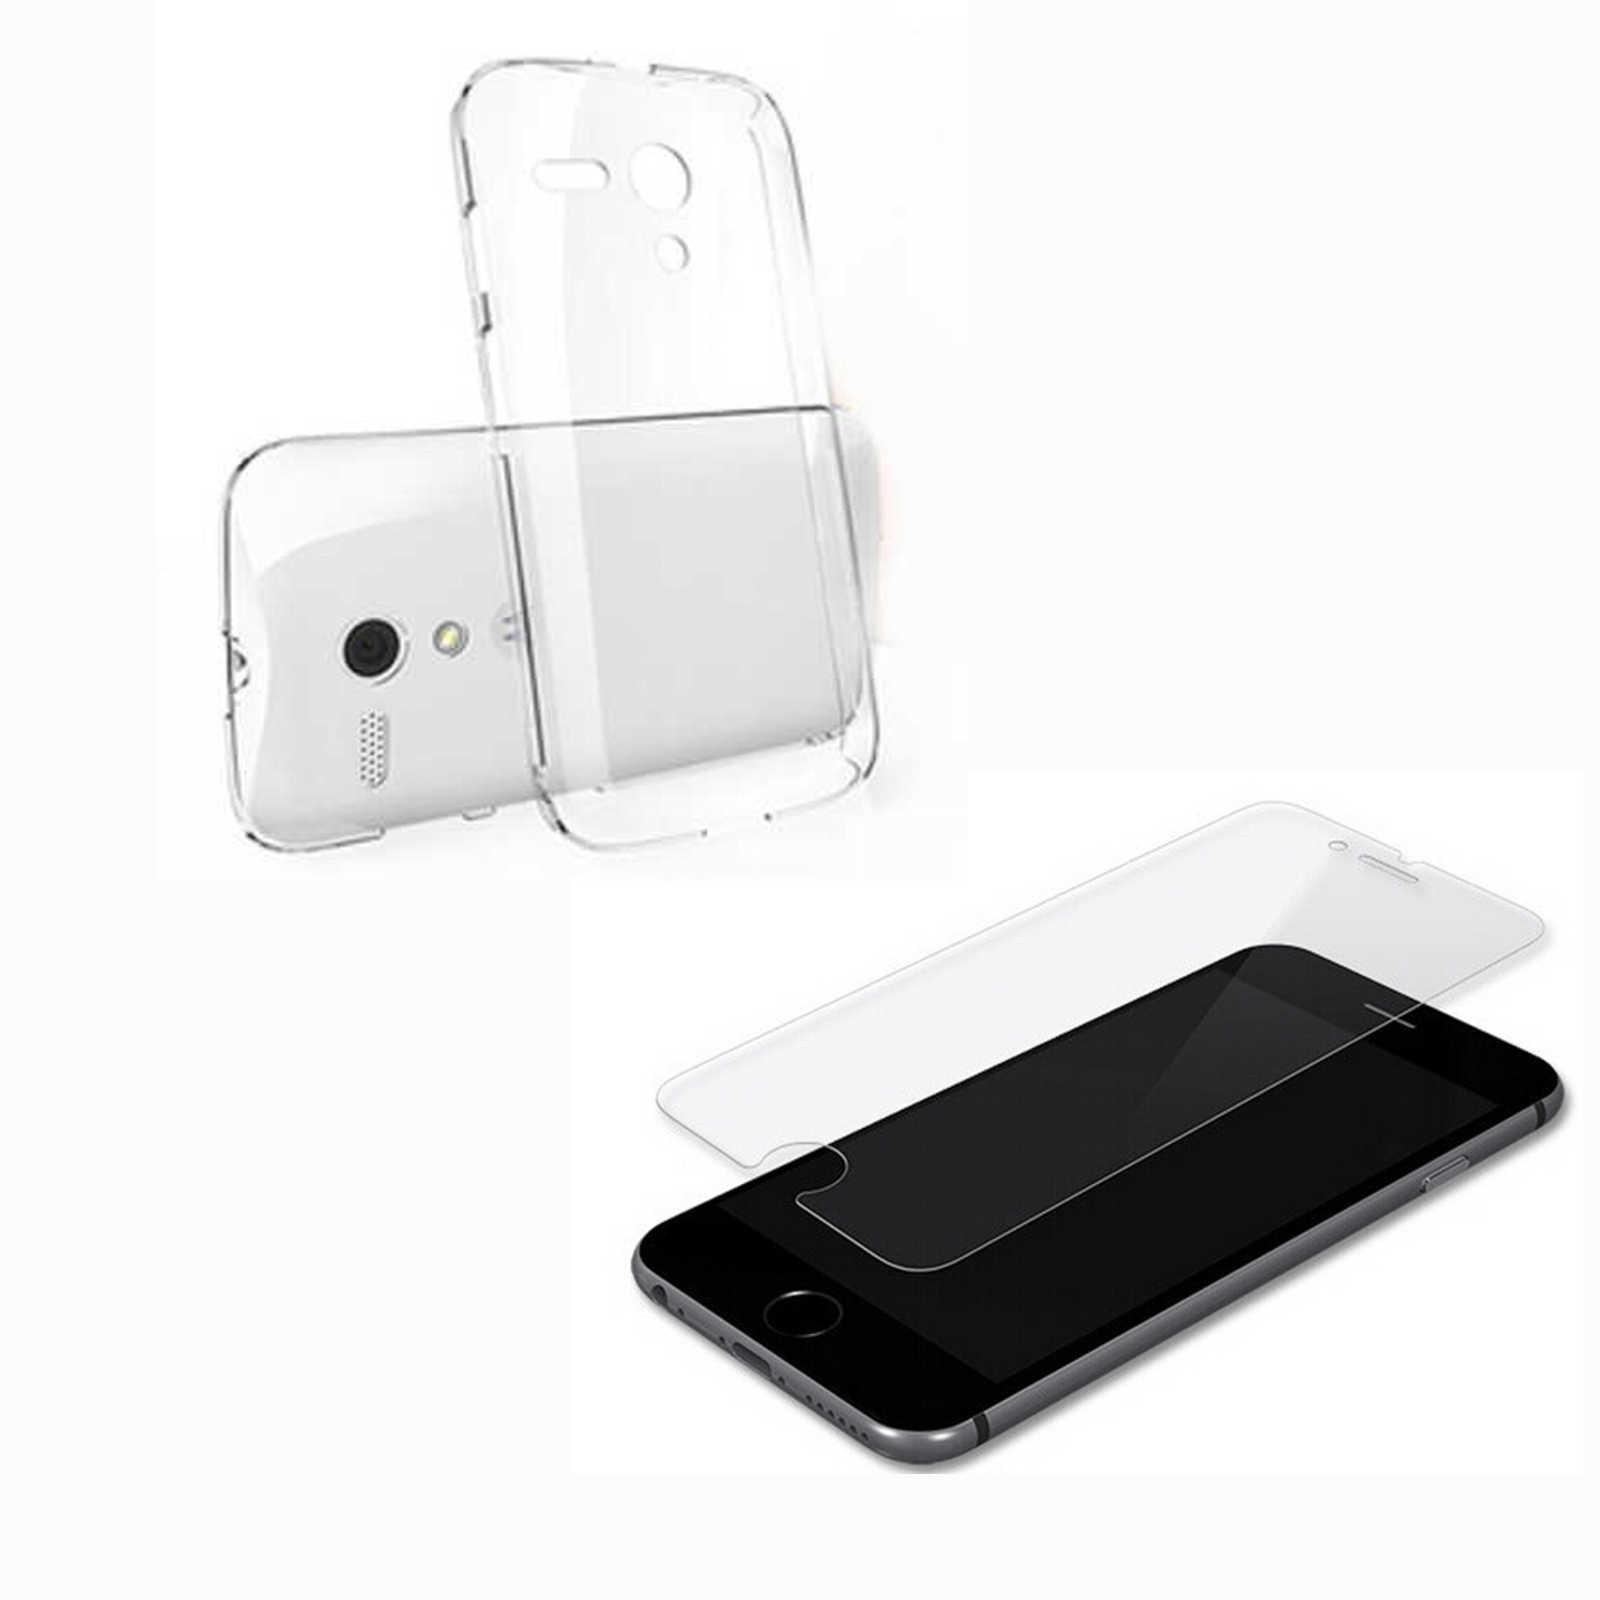 etui-TPU-Coque-Ultra-Mince-transparent-clair-verre-trempe-verre-H9-Pare-chocs